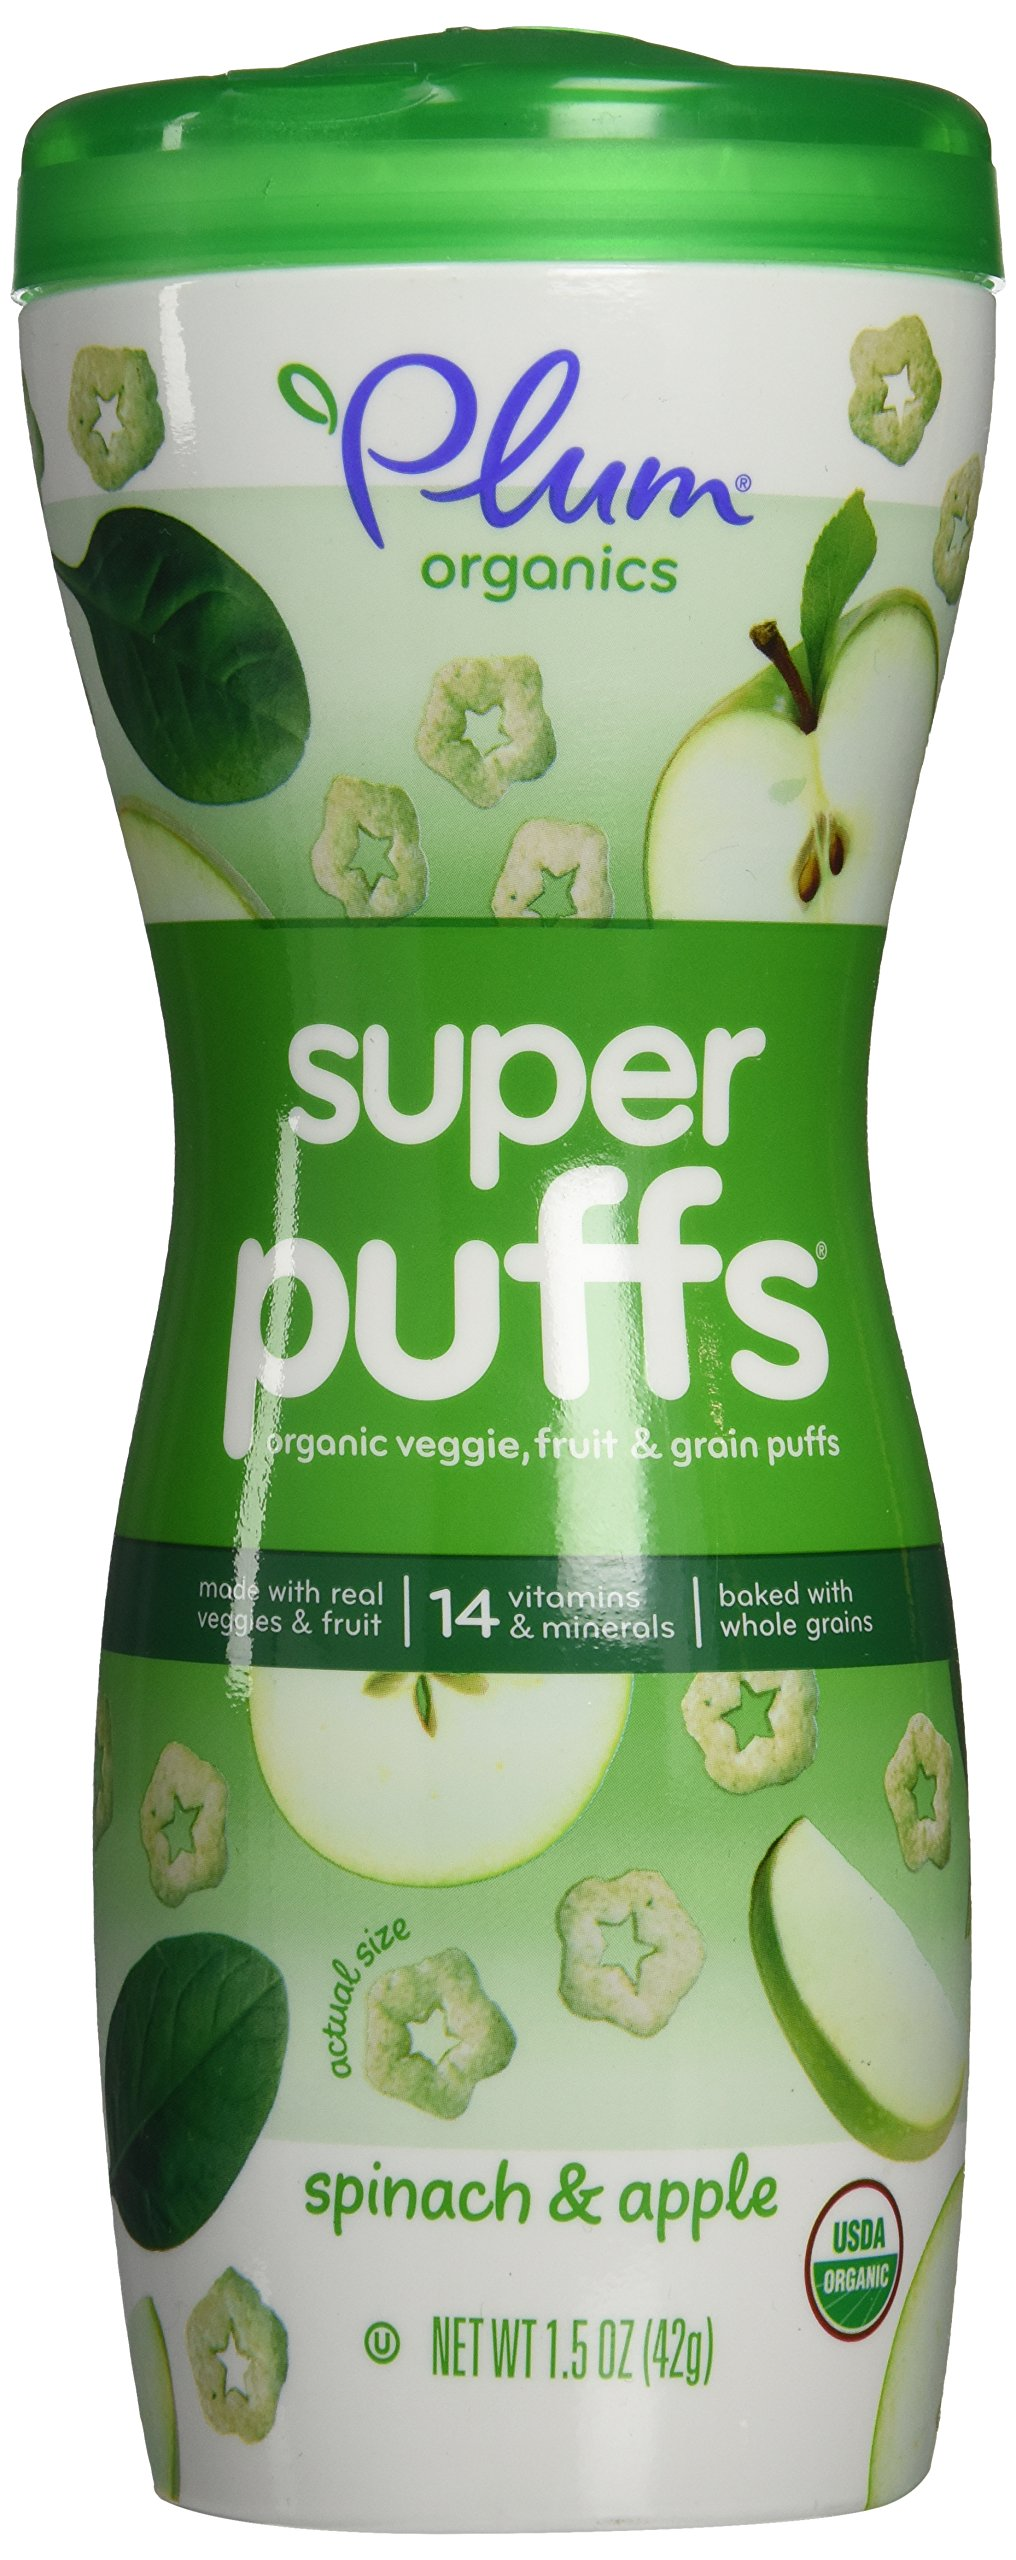 Plum Organics Super Puffs, Organic Baby Puffs, Apple with Spinach, 1.5 oz